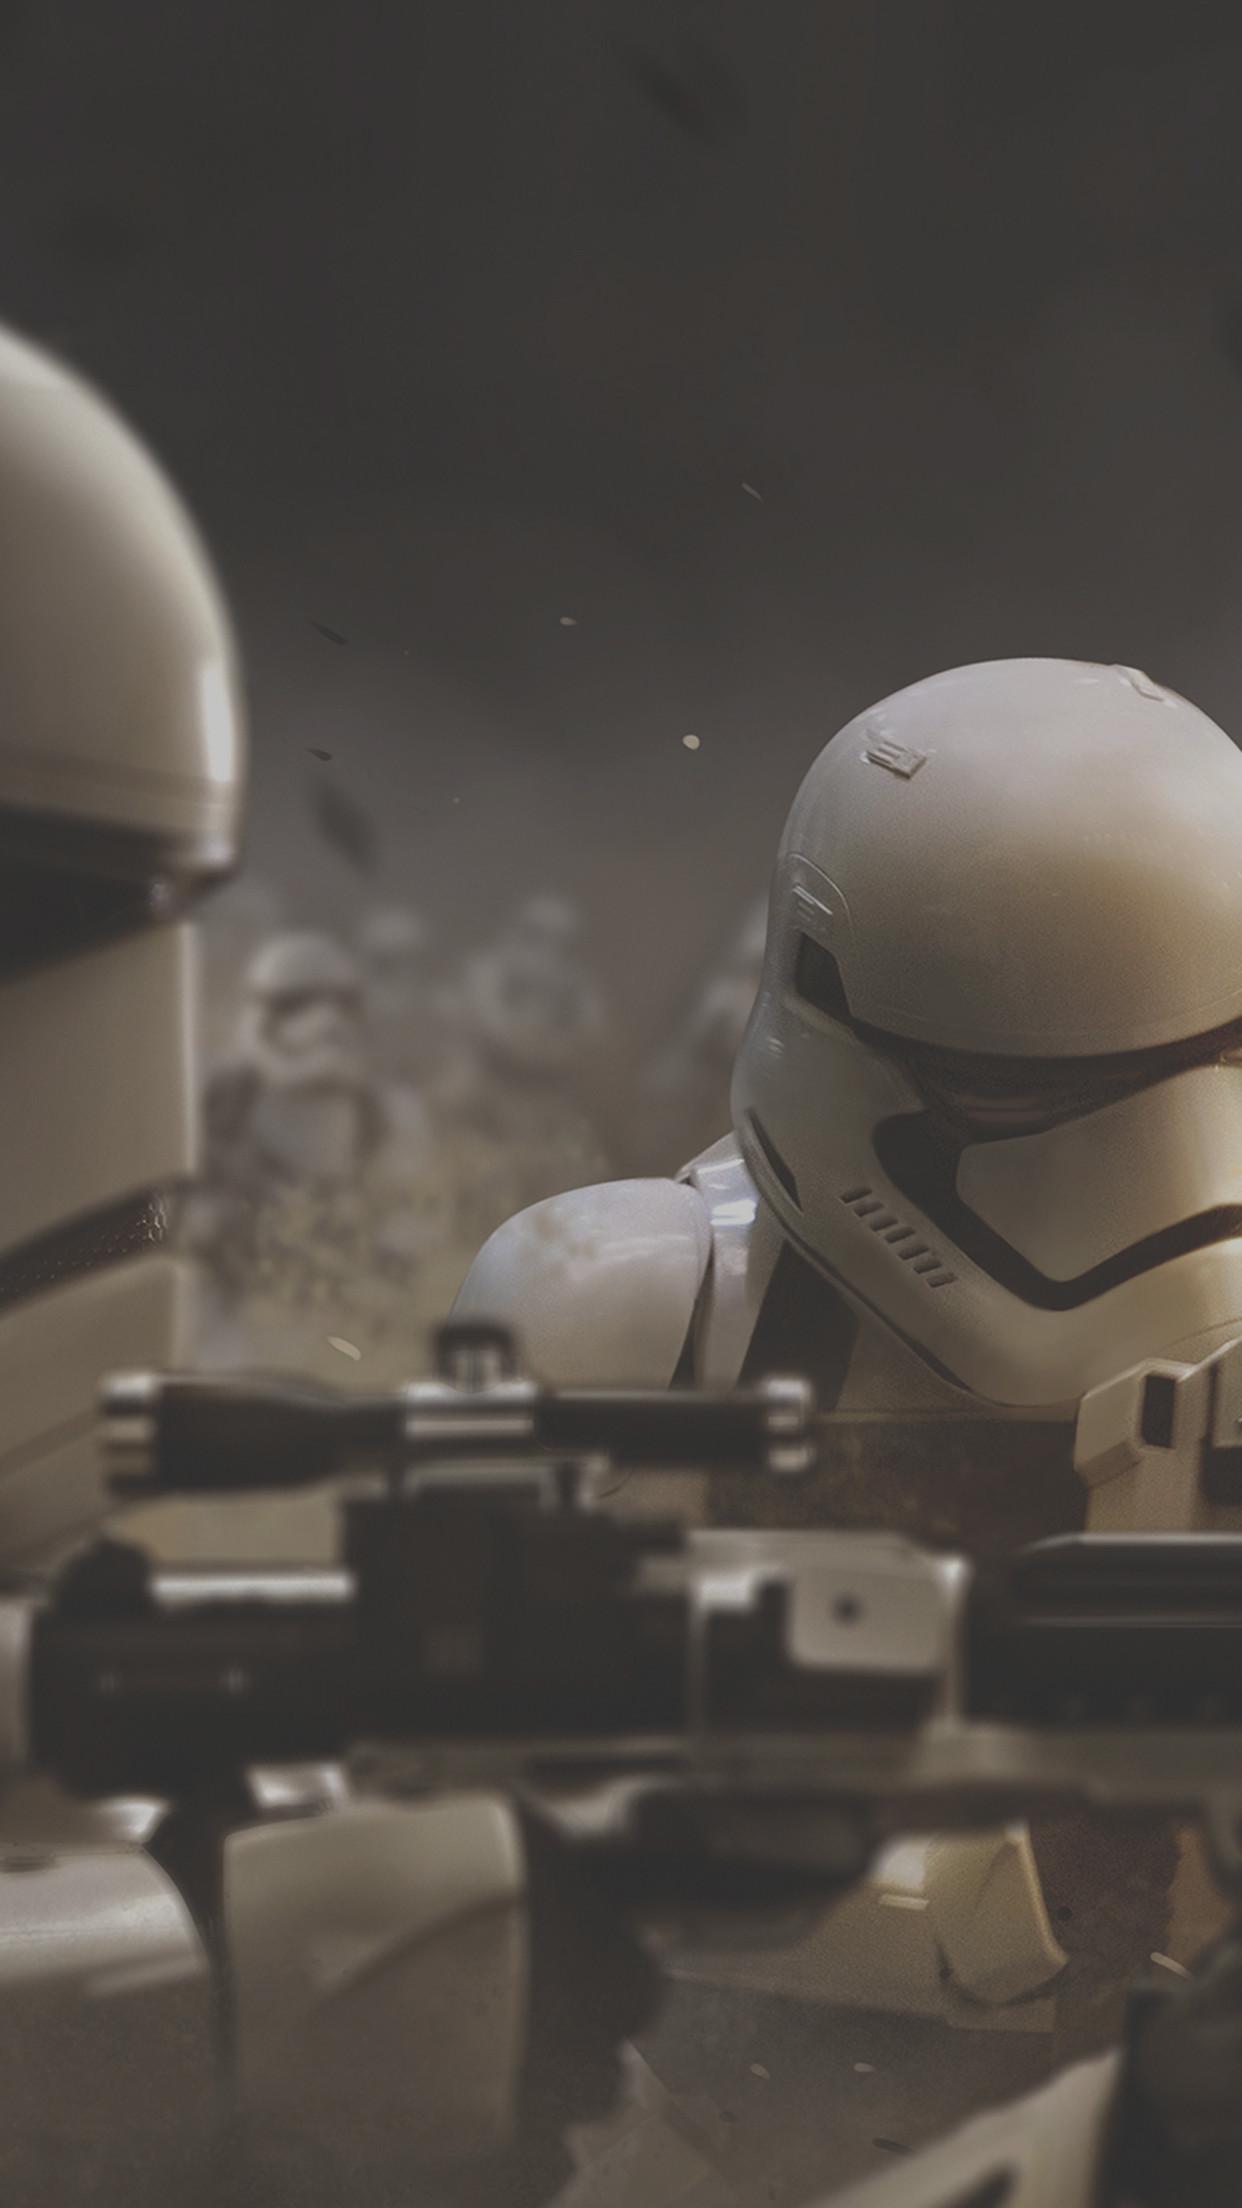 Star Wars The Force Awakens Stormtrooper Wallpaper iDeviceArt